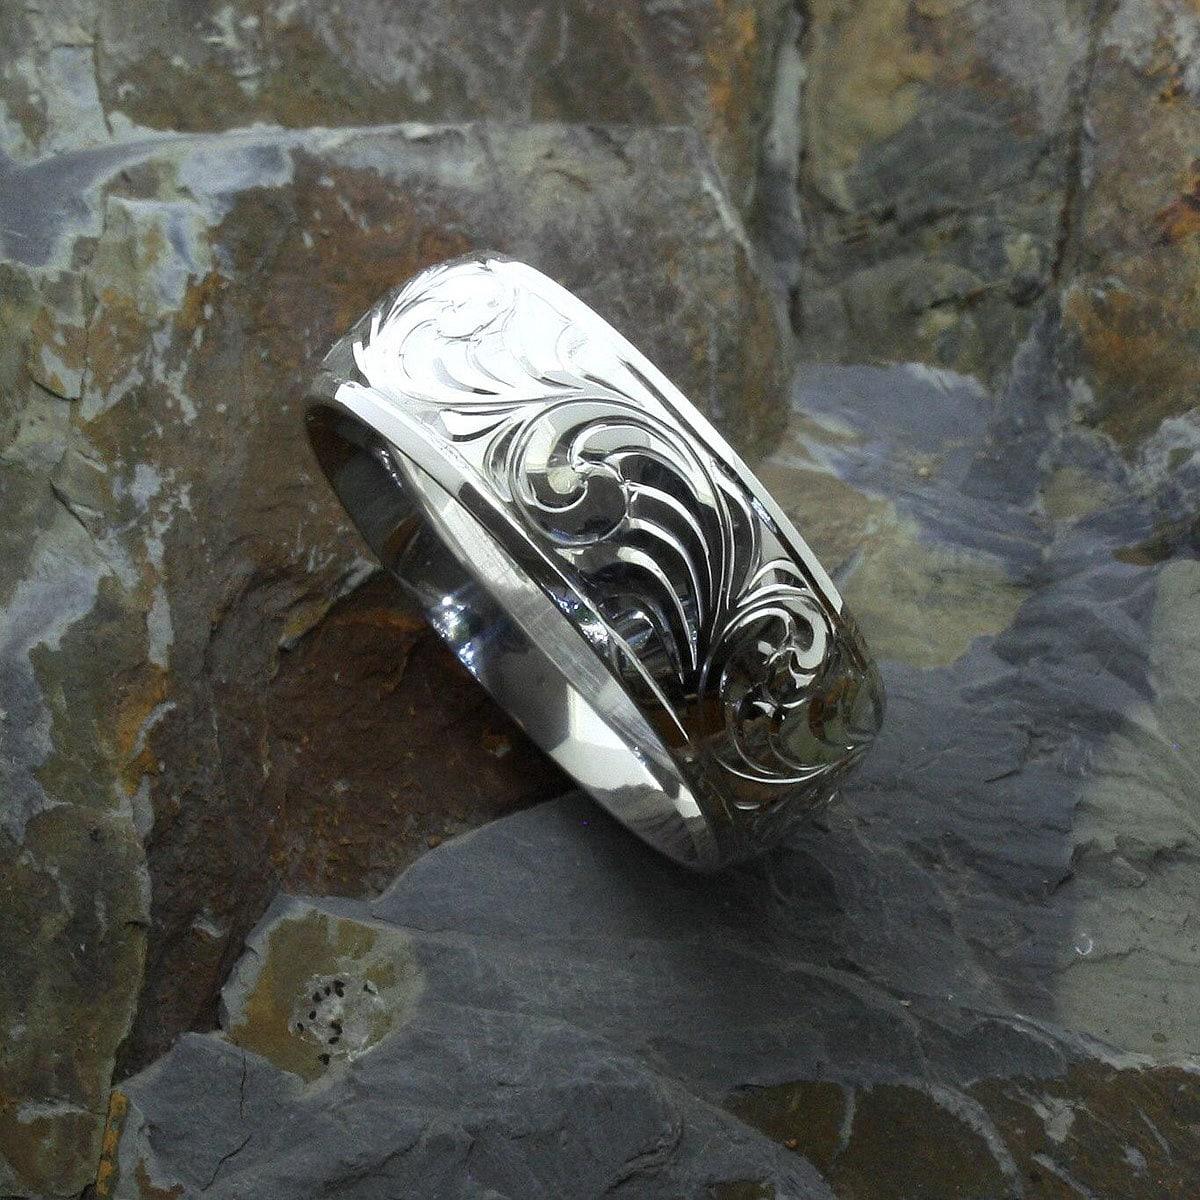 50: Handmade Western Style Wedding Rings At Reisefeber.org